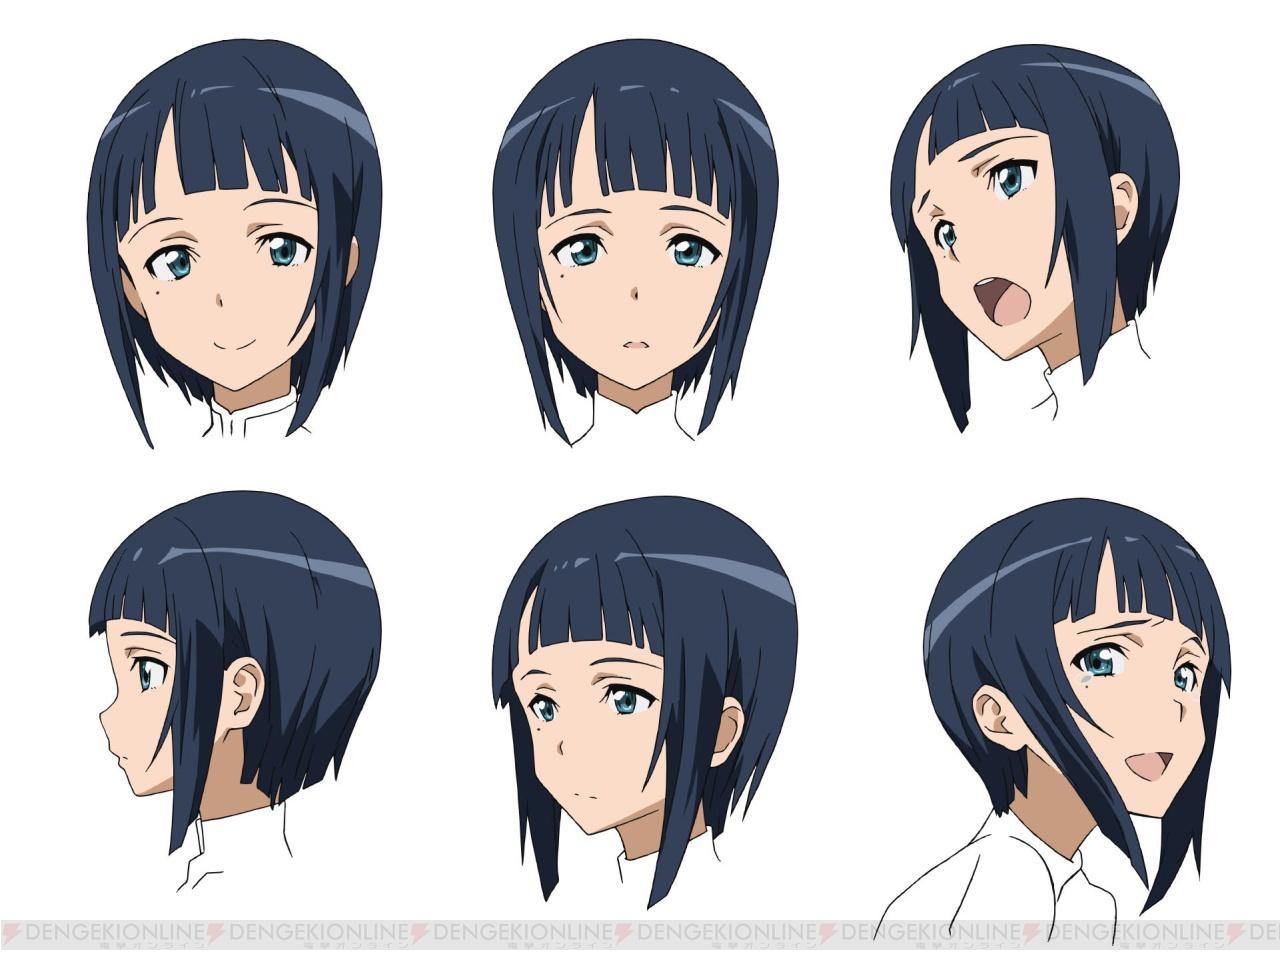 Coolest Anime Character Design : サチ(cv:早見沙織) ソードアートオンライン画像 壁紙に使える登場人物まとめ 【sao アスナ キリト シノン